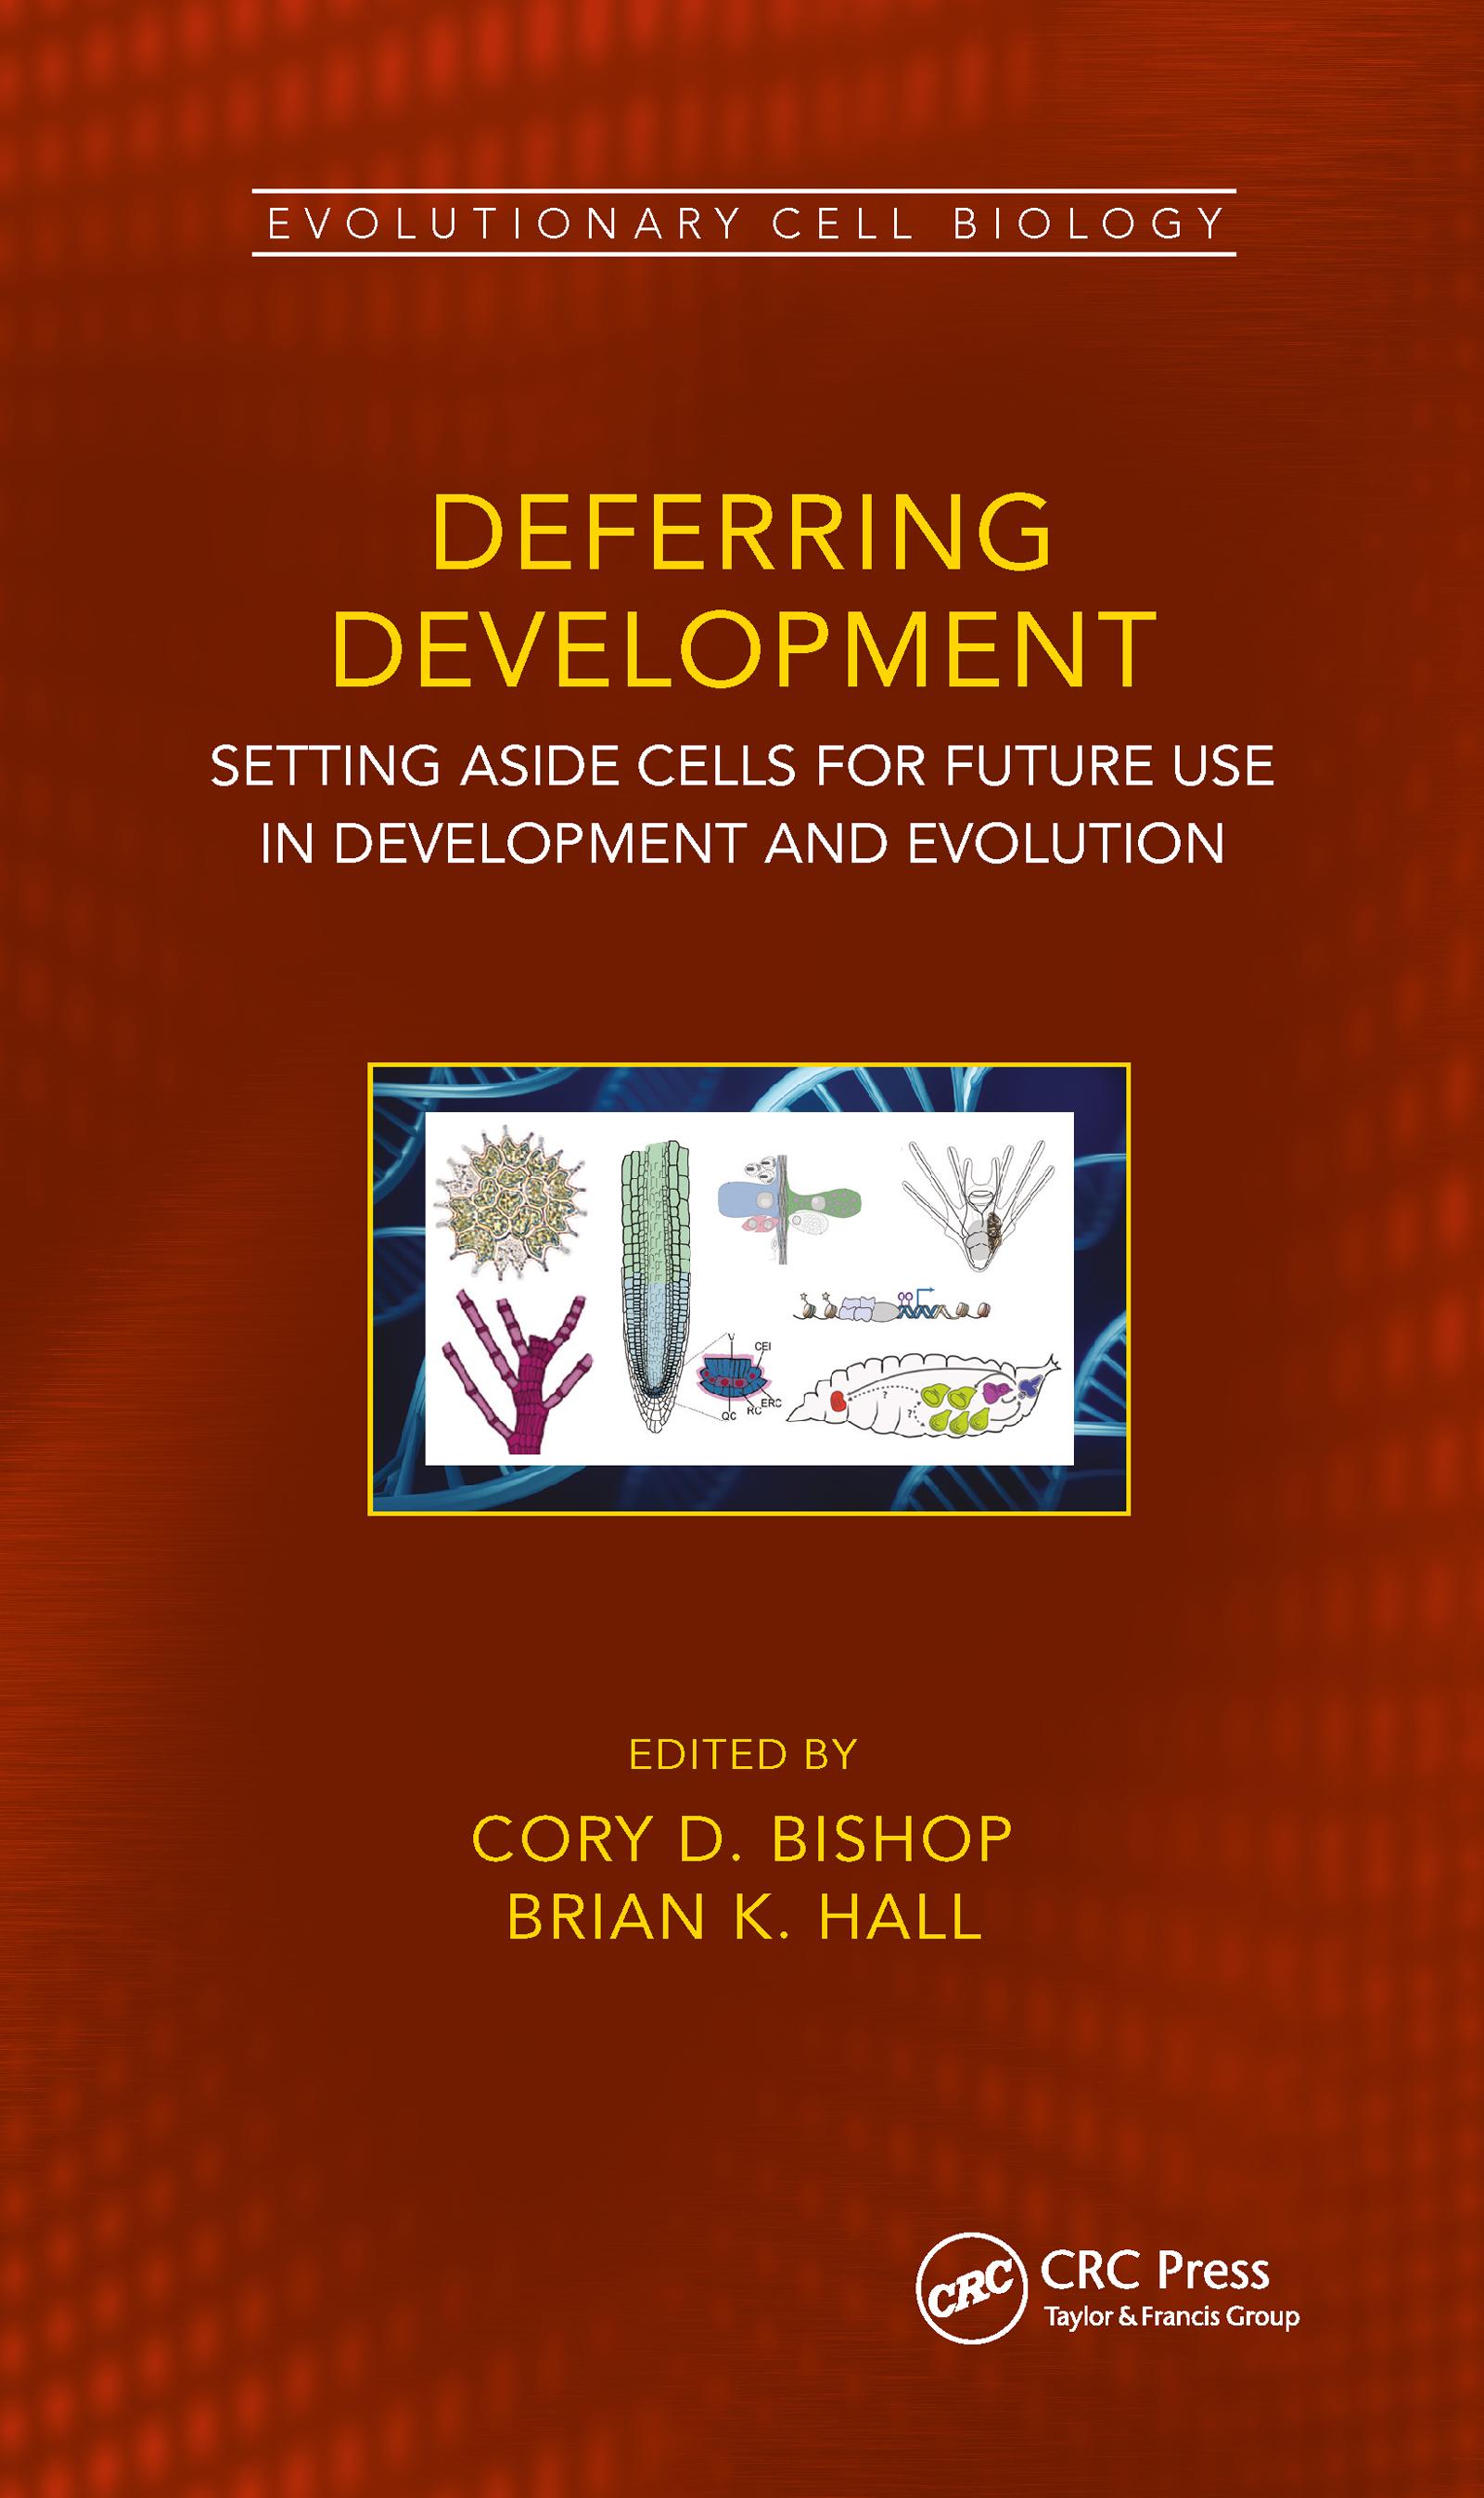 Deferred Development